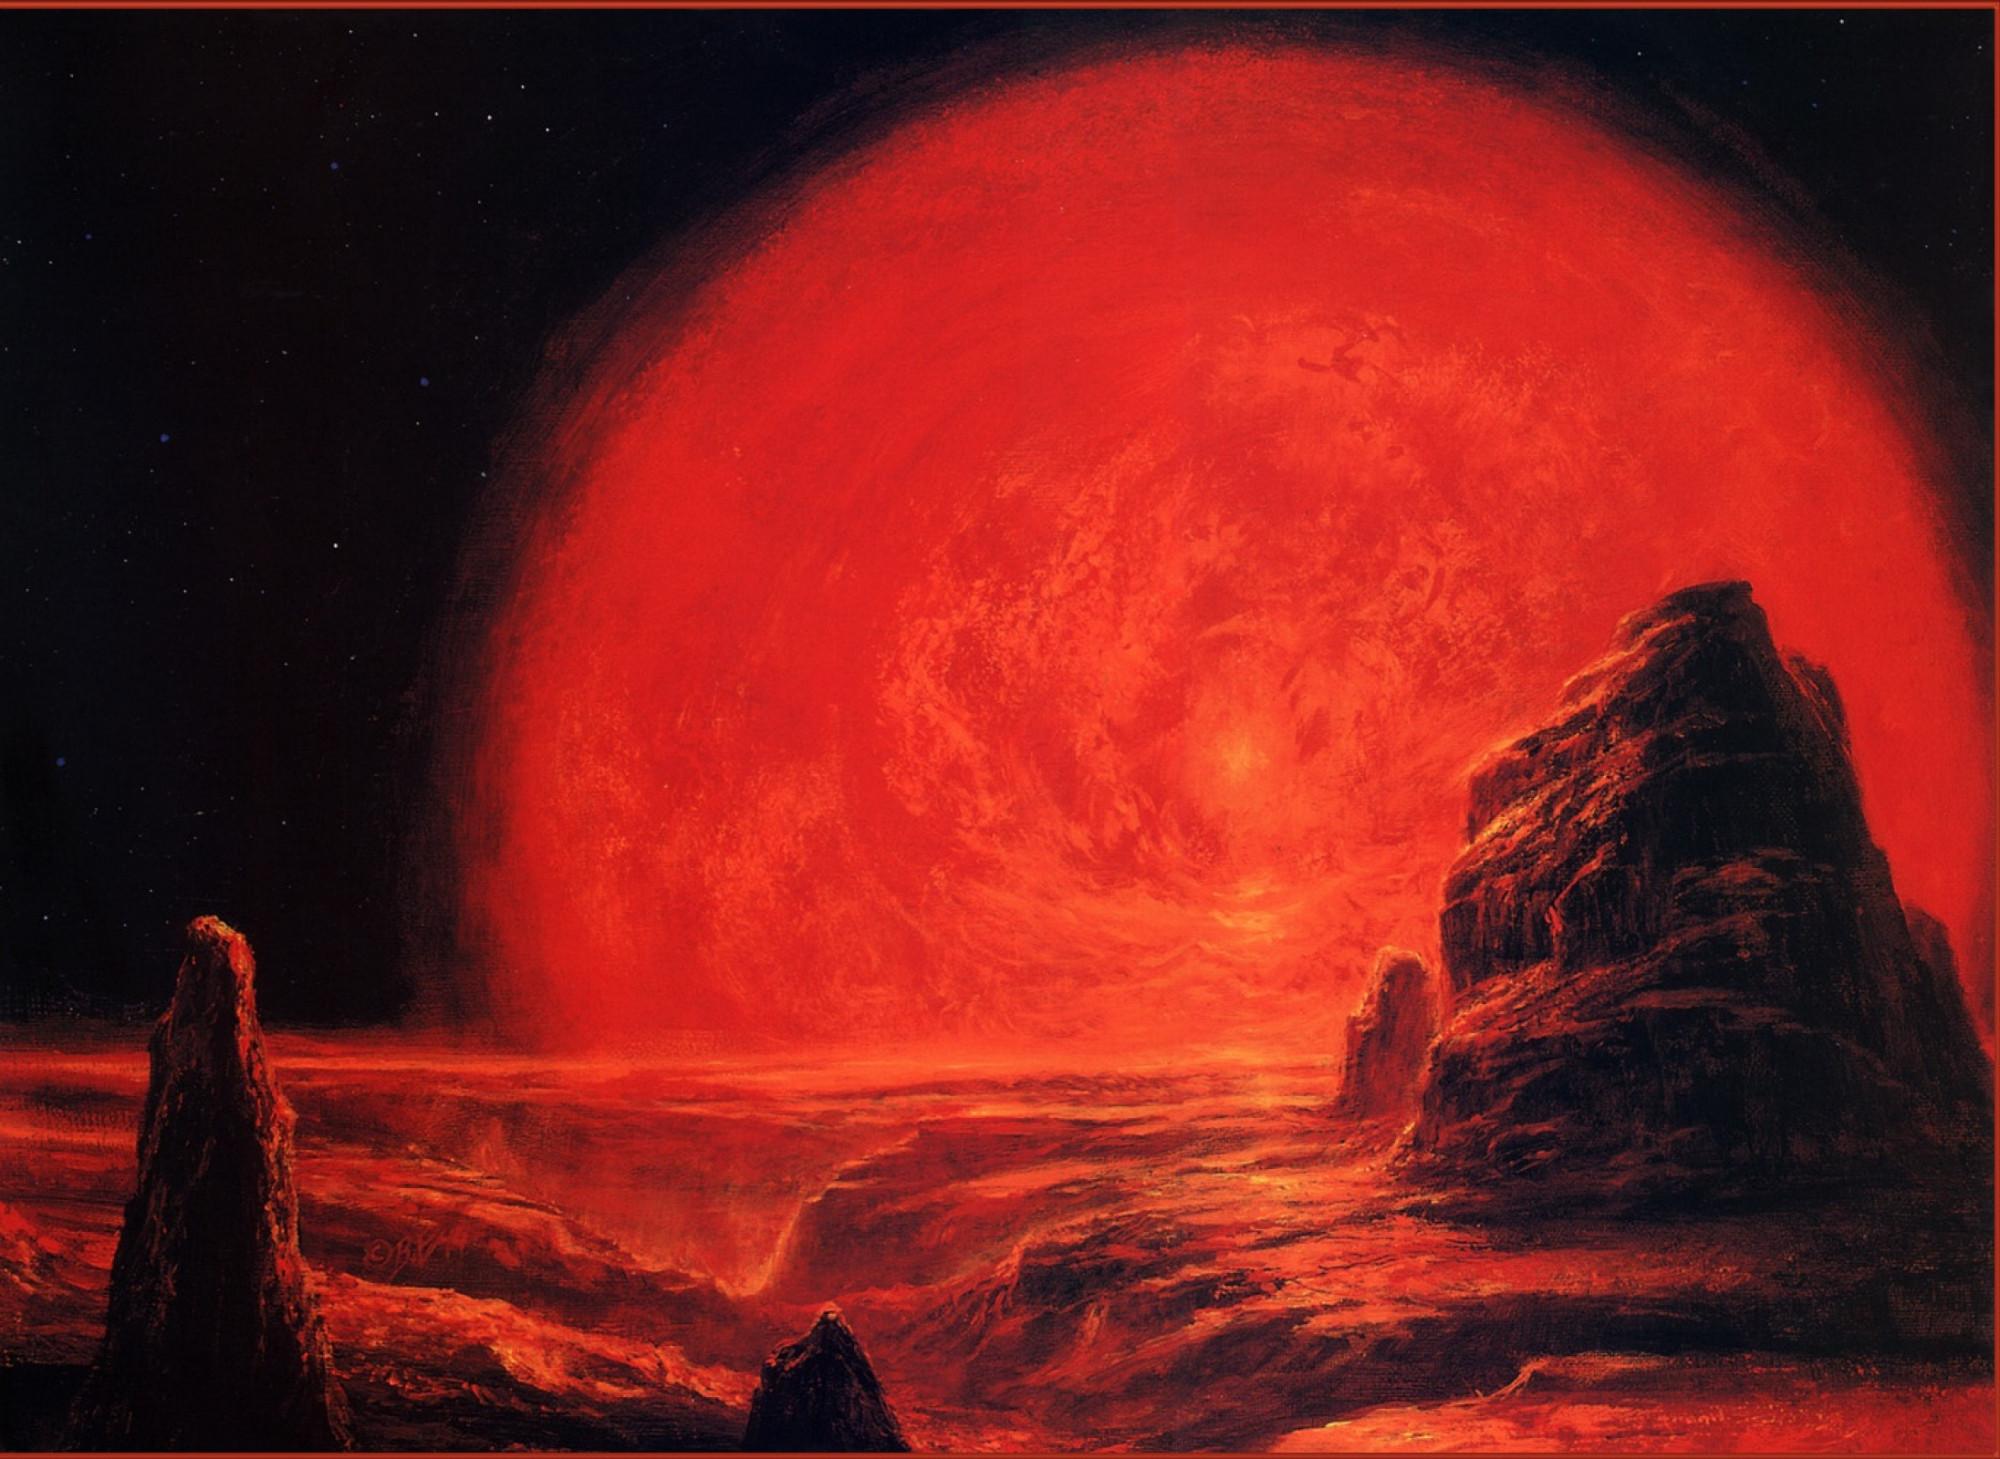 red giant sun - HD1096×800